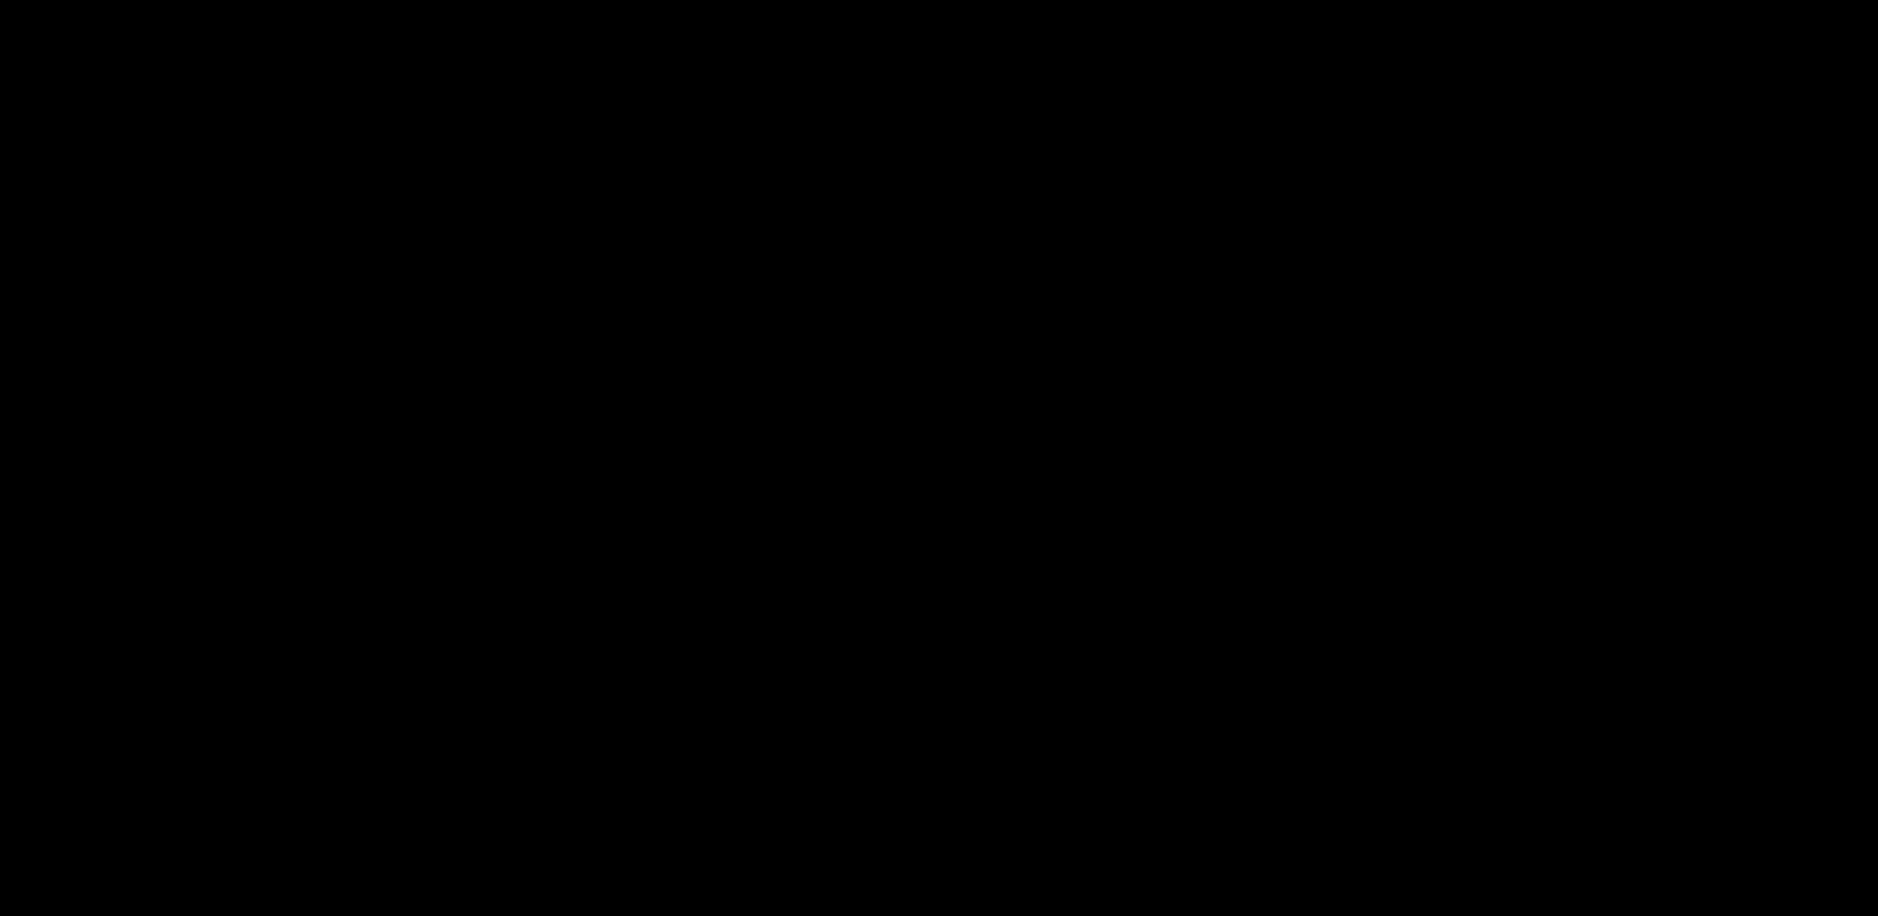 D-Valacyclovir hydrochloride